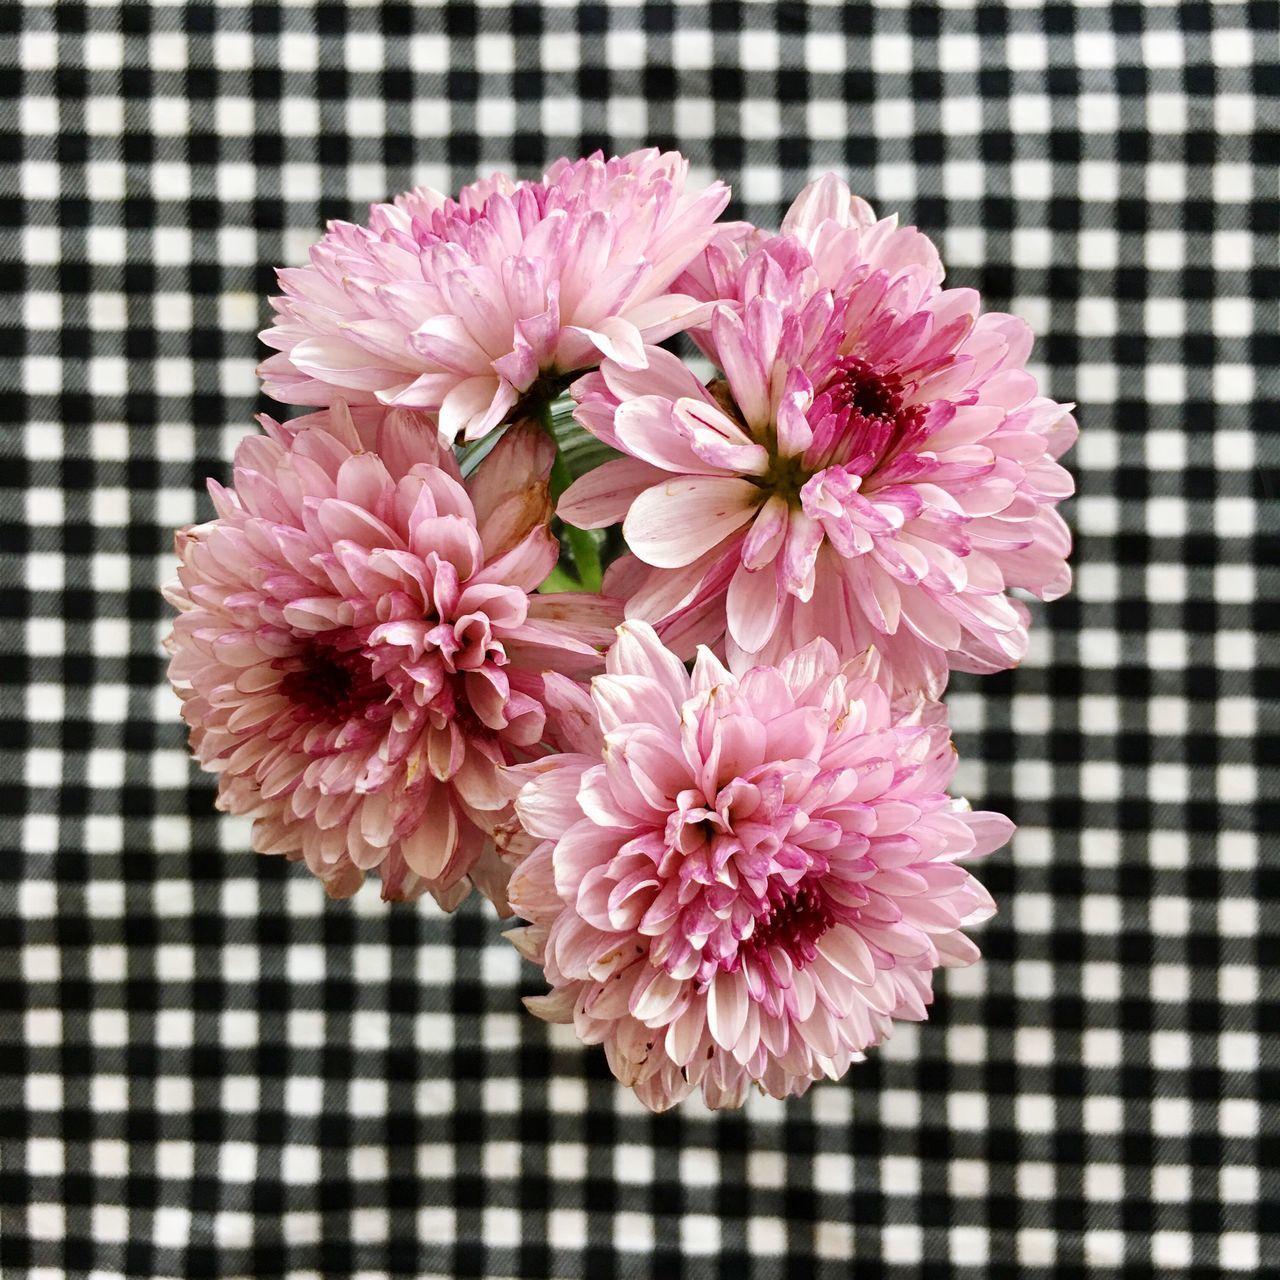 Flower Close-up Pink Color Freshness No People Petal Flower Head Fragility Indoors  Nature Day Flower Arrangement Dahlia